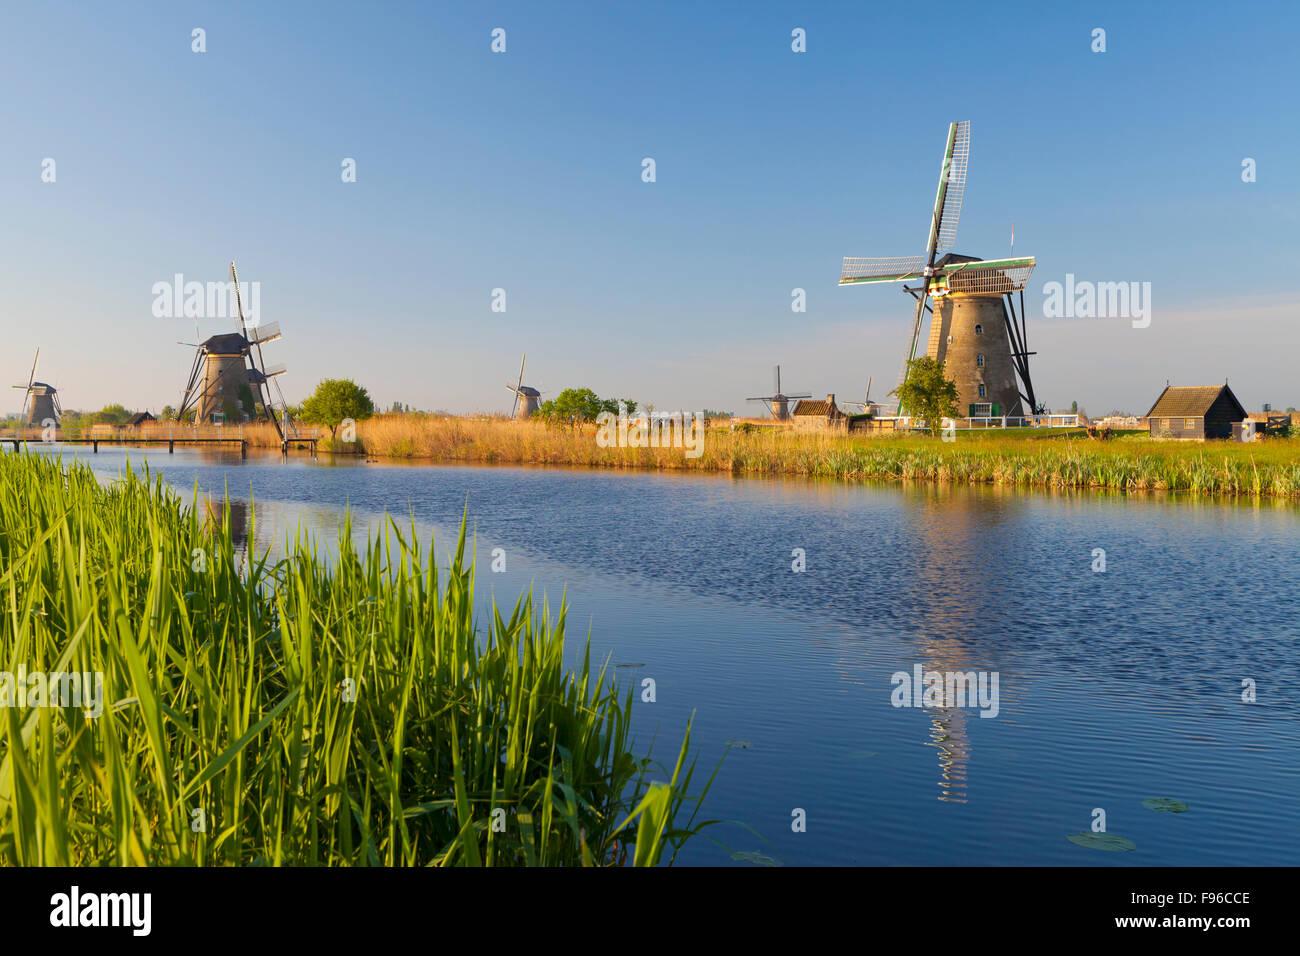 Historic Windmills at Kinderdijk, South Holland, Netherlands Stock Photo